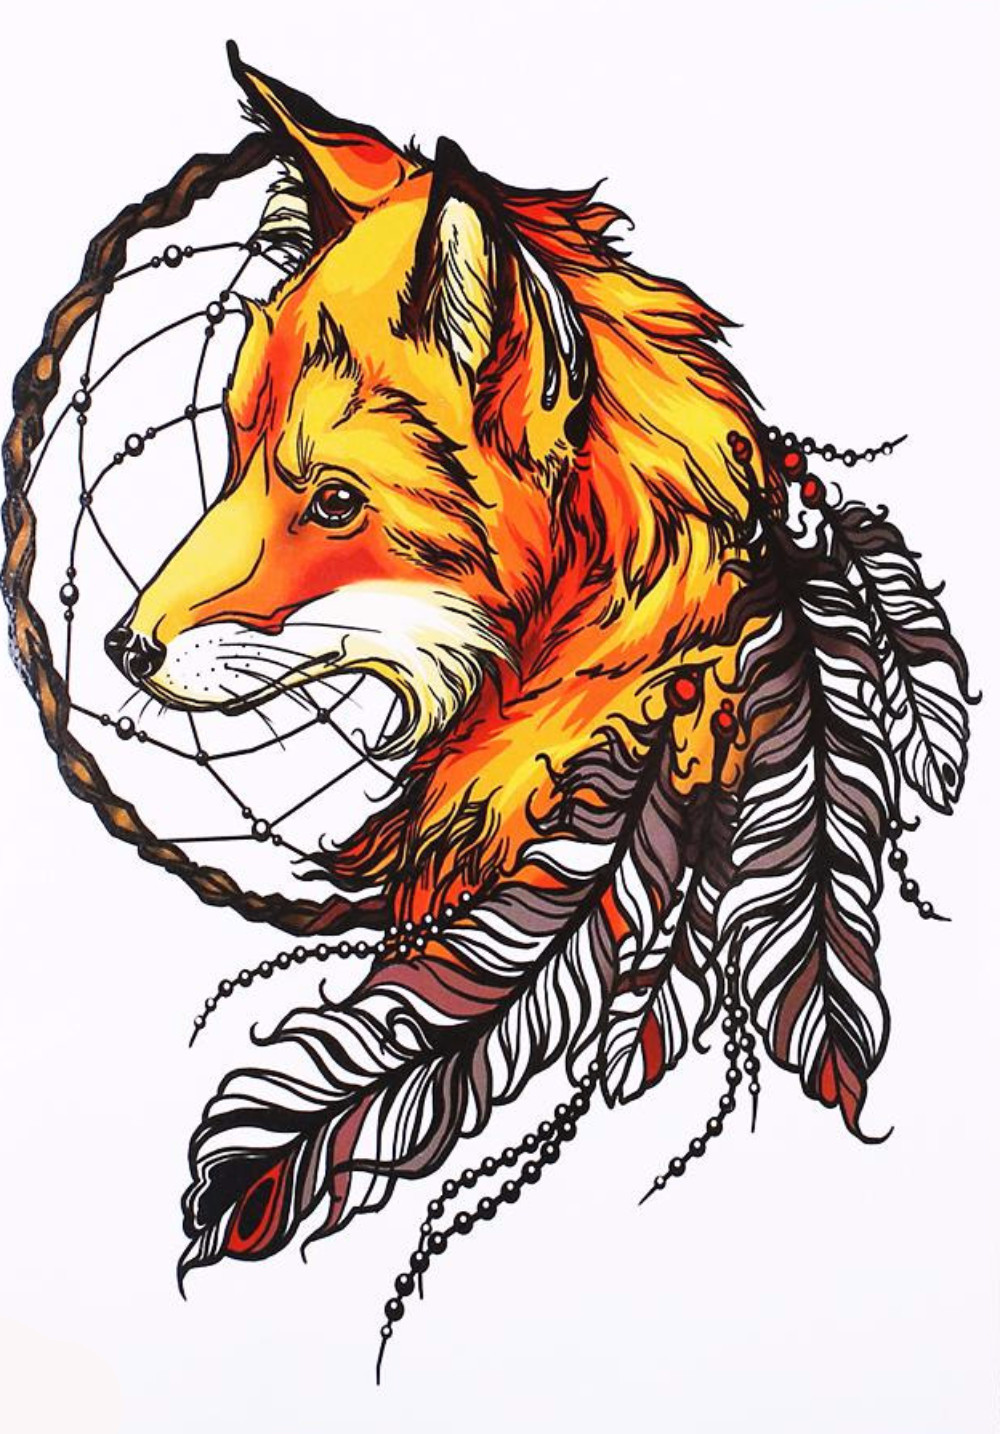 Fox temporary tattoo dreamcatcher pinterest tatouage renard and tatouages renard - Dessin renard ...